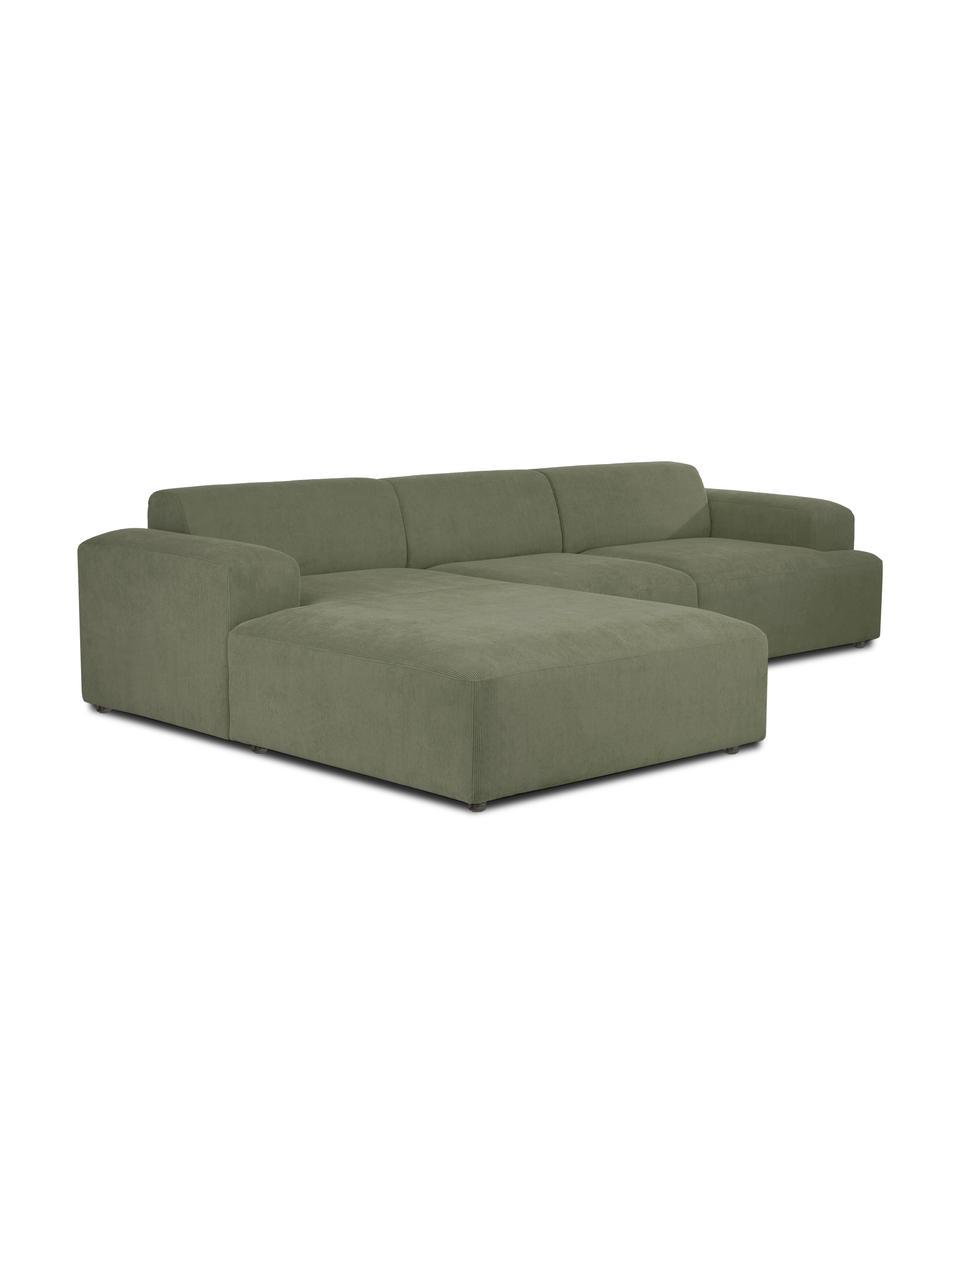 Ribfluwelen hoekbank Melva (4-zits) in groen, Bekleding: corduroy (92% polyester, , Frame: massief grenenhout, FSC-g, Poten: kunststof, Corduroy groen, B 319 x D 196 cm